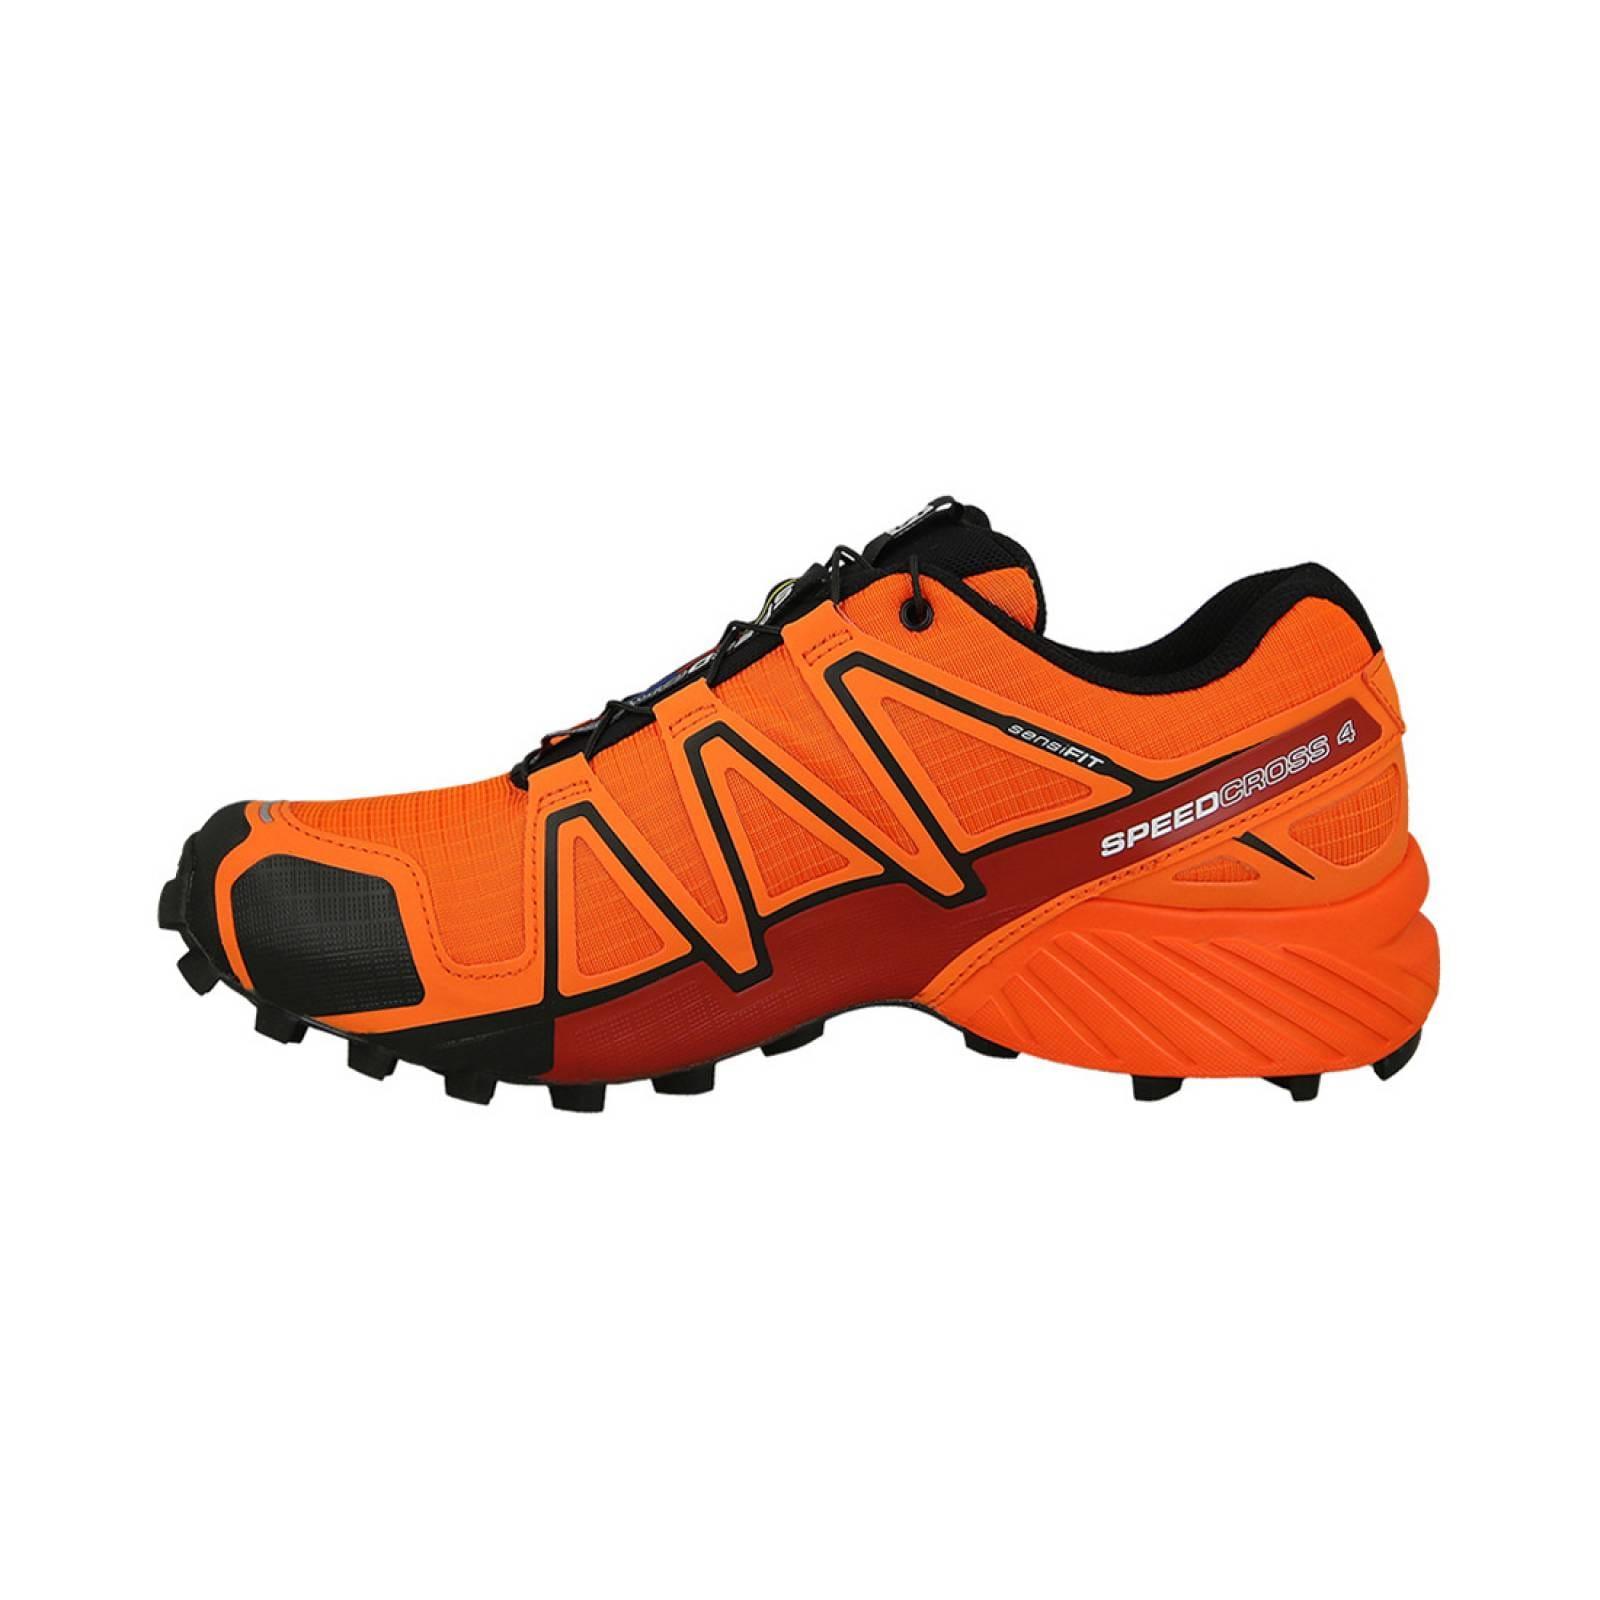 salomon speedcross 3 trail running naranja mecanica